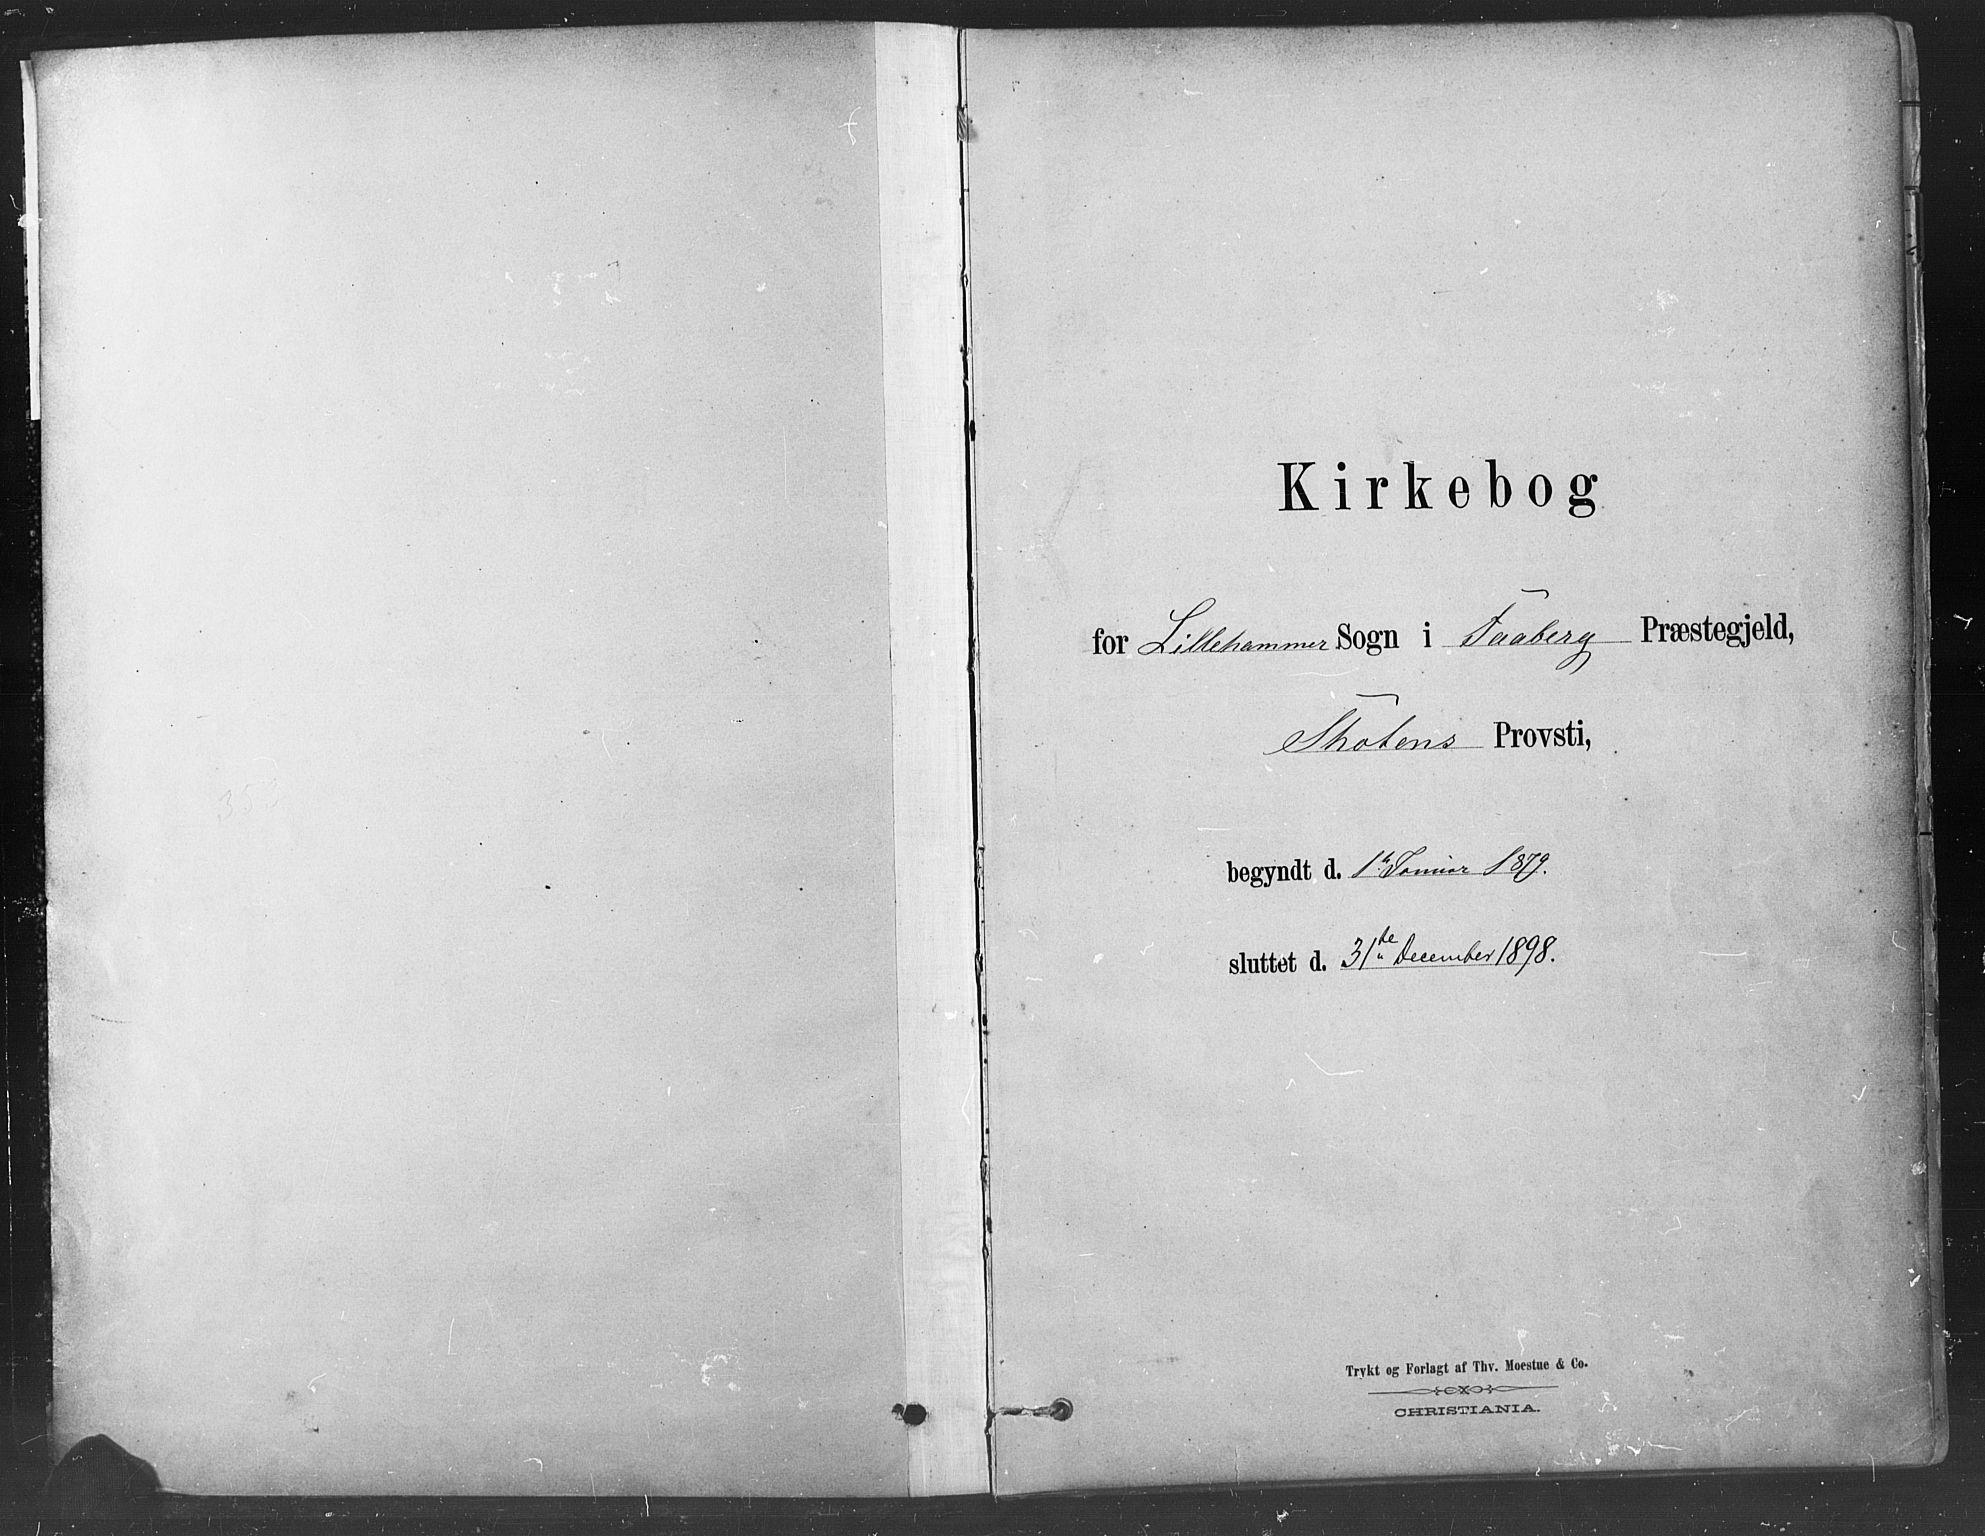 SAH, Fåberg prestekontor, Ministerialbok nr. 9, 1879-1898